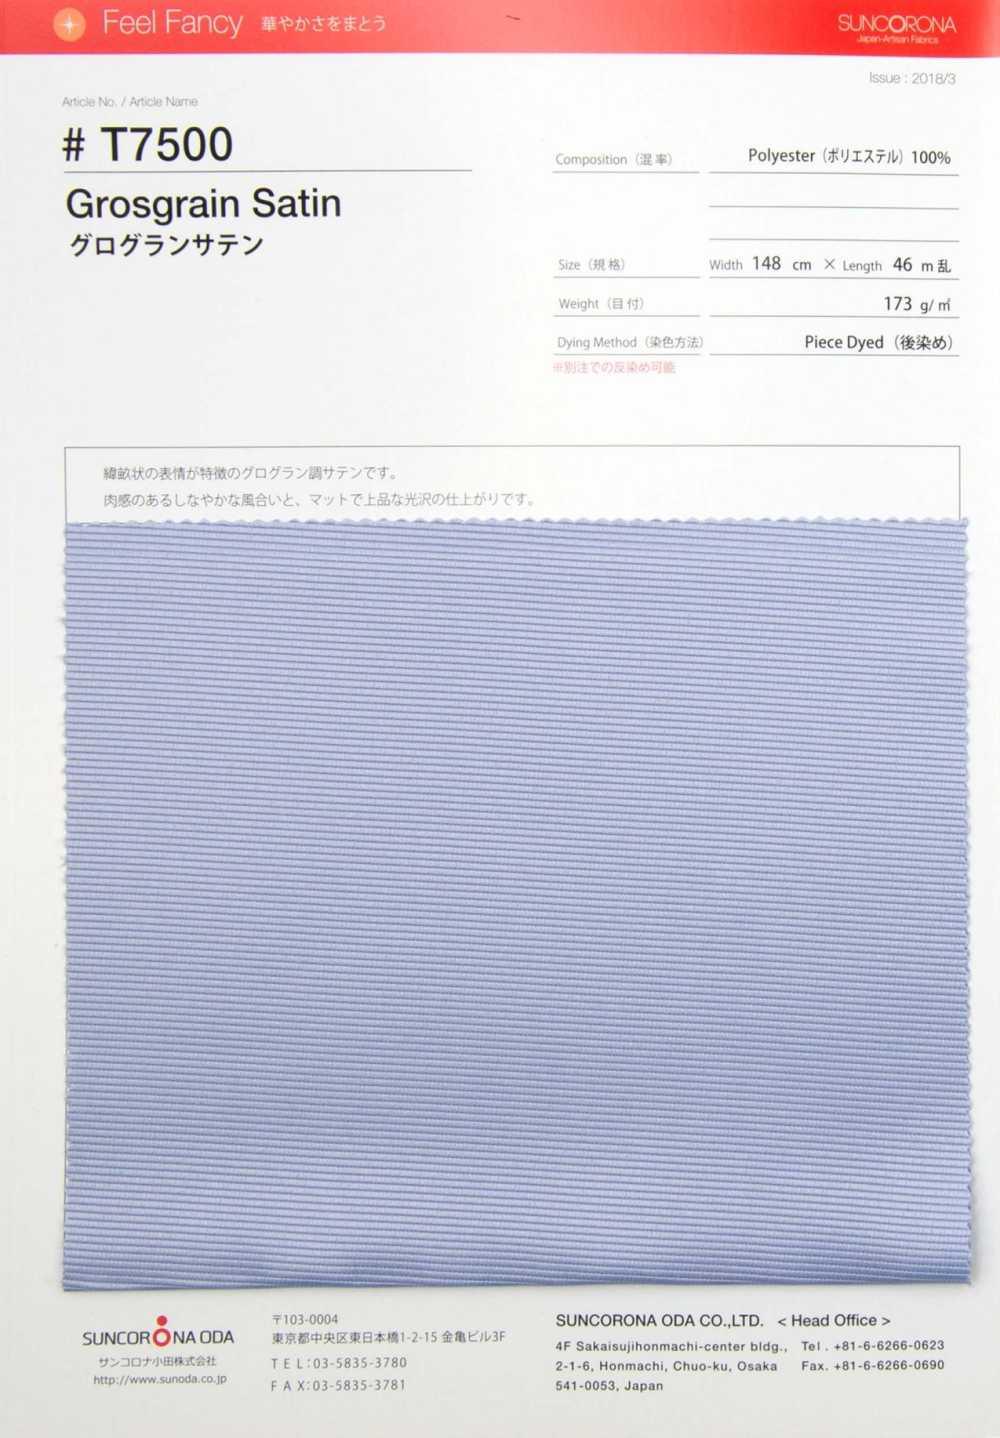 T7500 グログランサテン[生地] サンコロナ小田/オークラ商事 - ApparelX アパレル資材卸通販